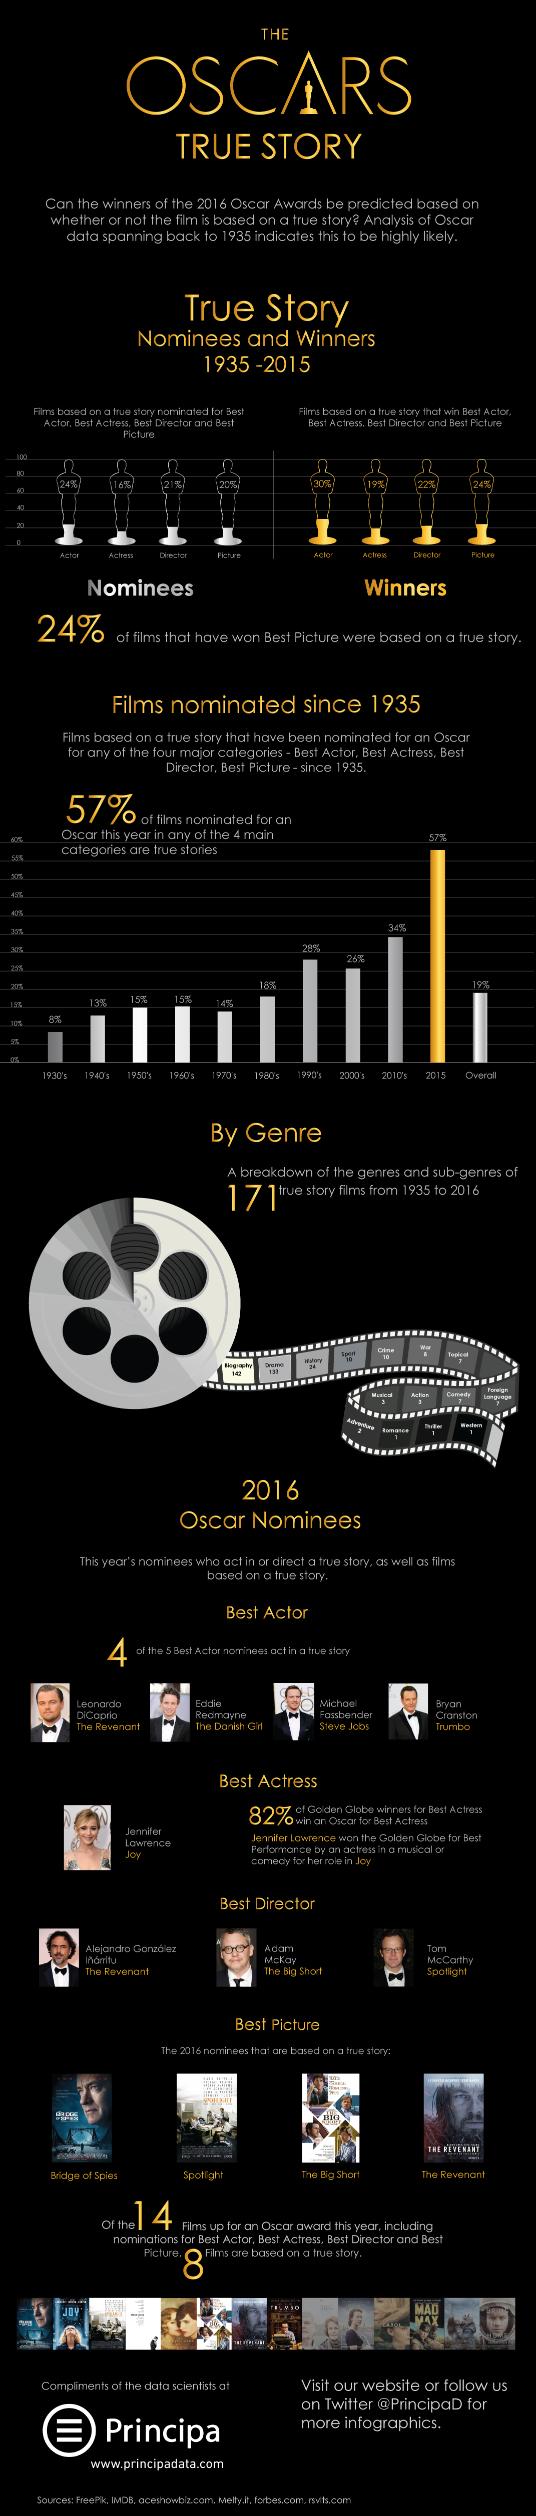 infographic-principa-predicts-oscars-true-story-oscars1.png